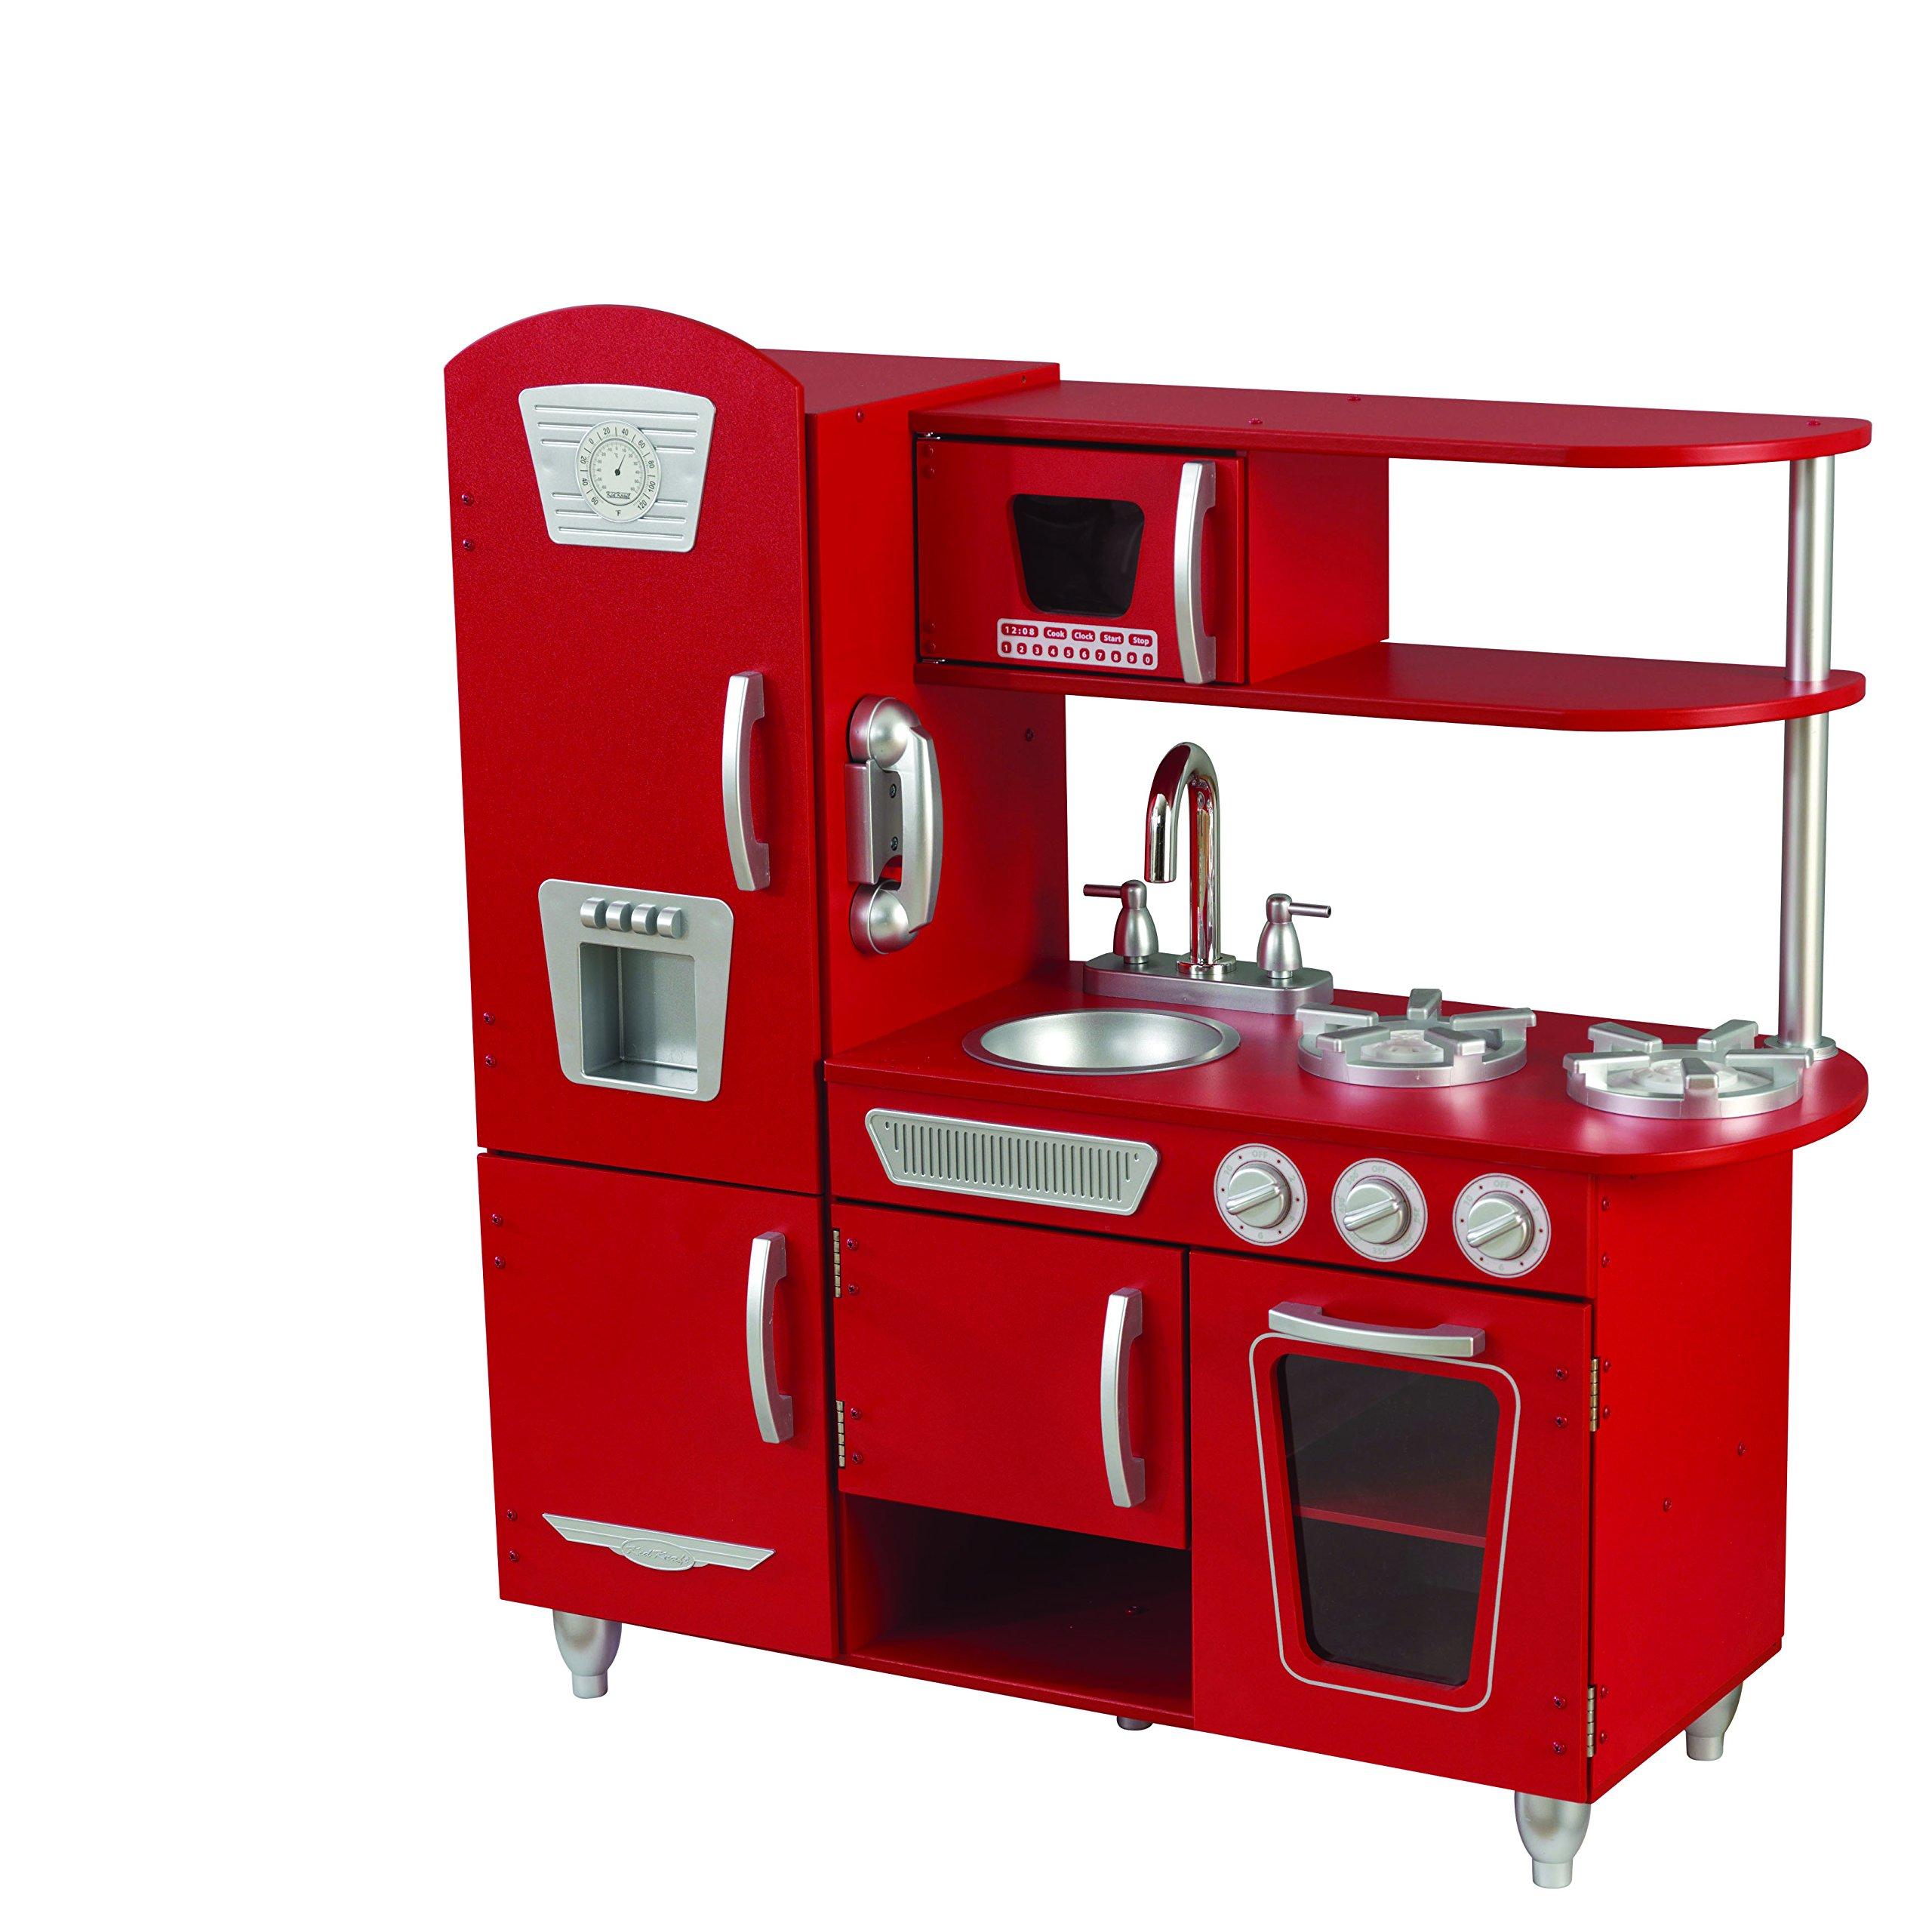 KidKraft Vintage Play Kitchen - Red by KidKraft (Image #1)